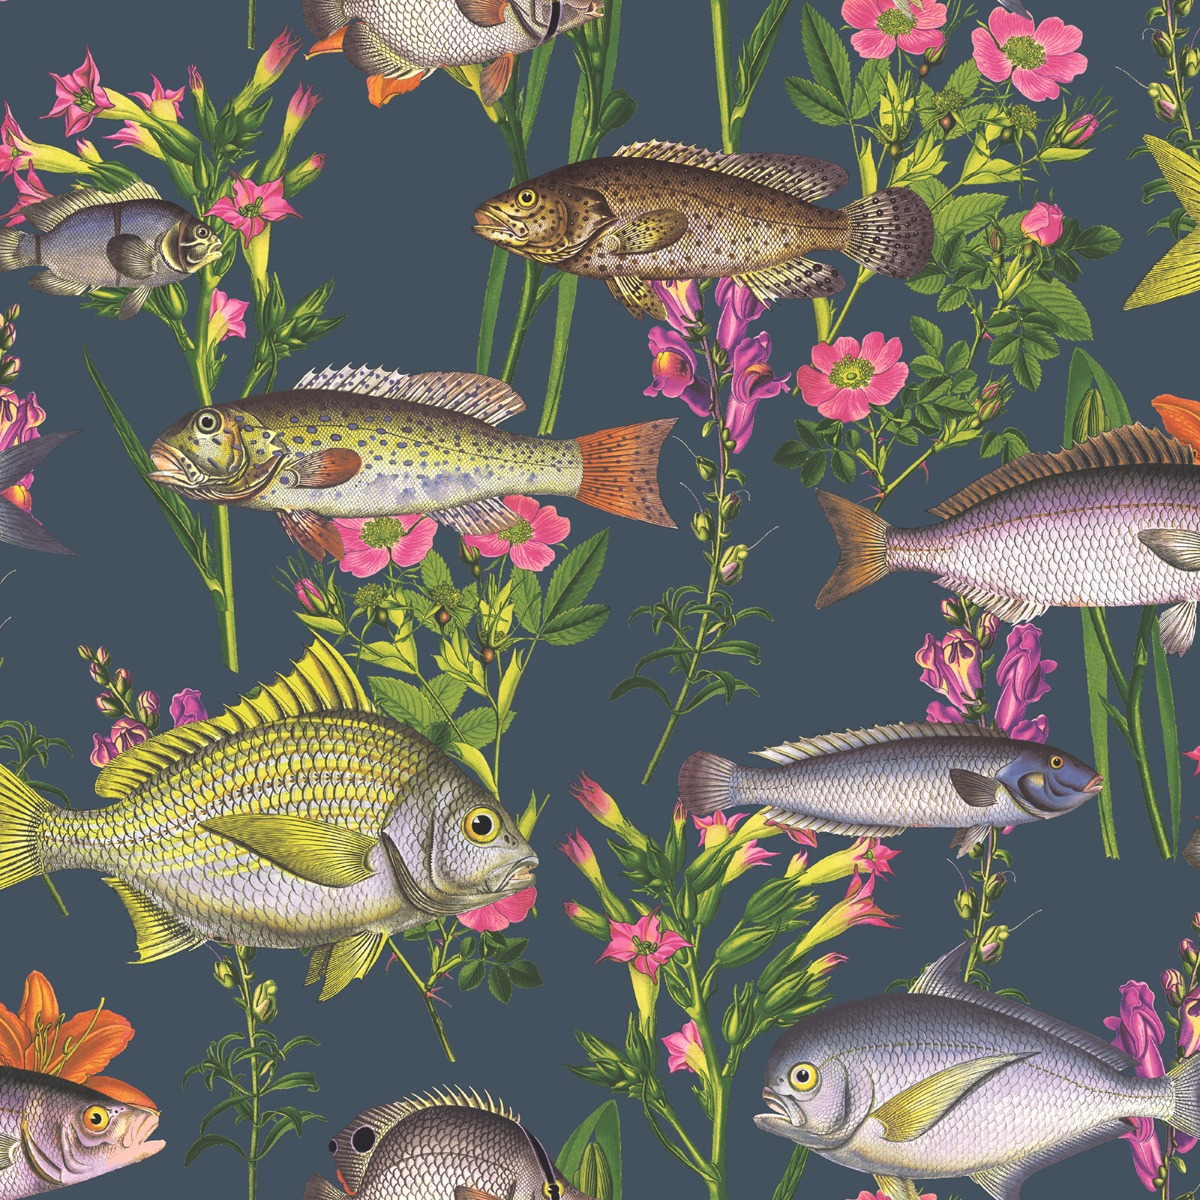 Lagoon Fish Wallpaper Midnight Blue World of Wallpaper 50150